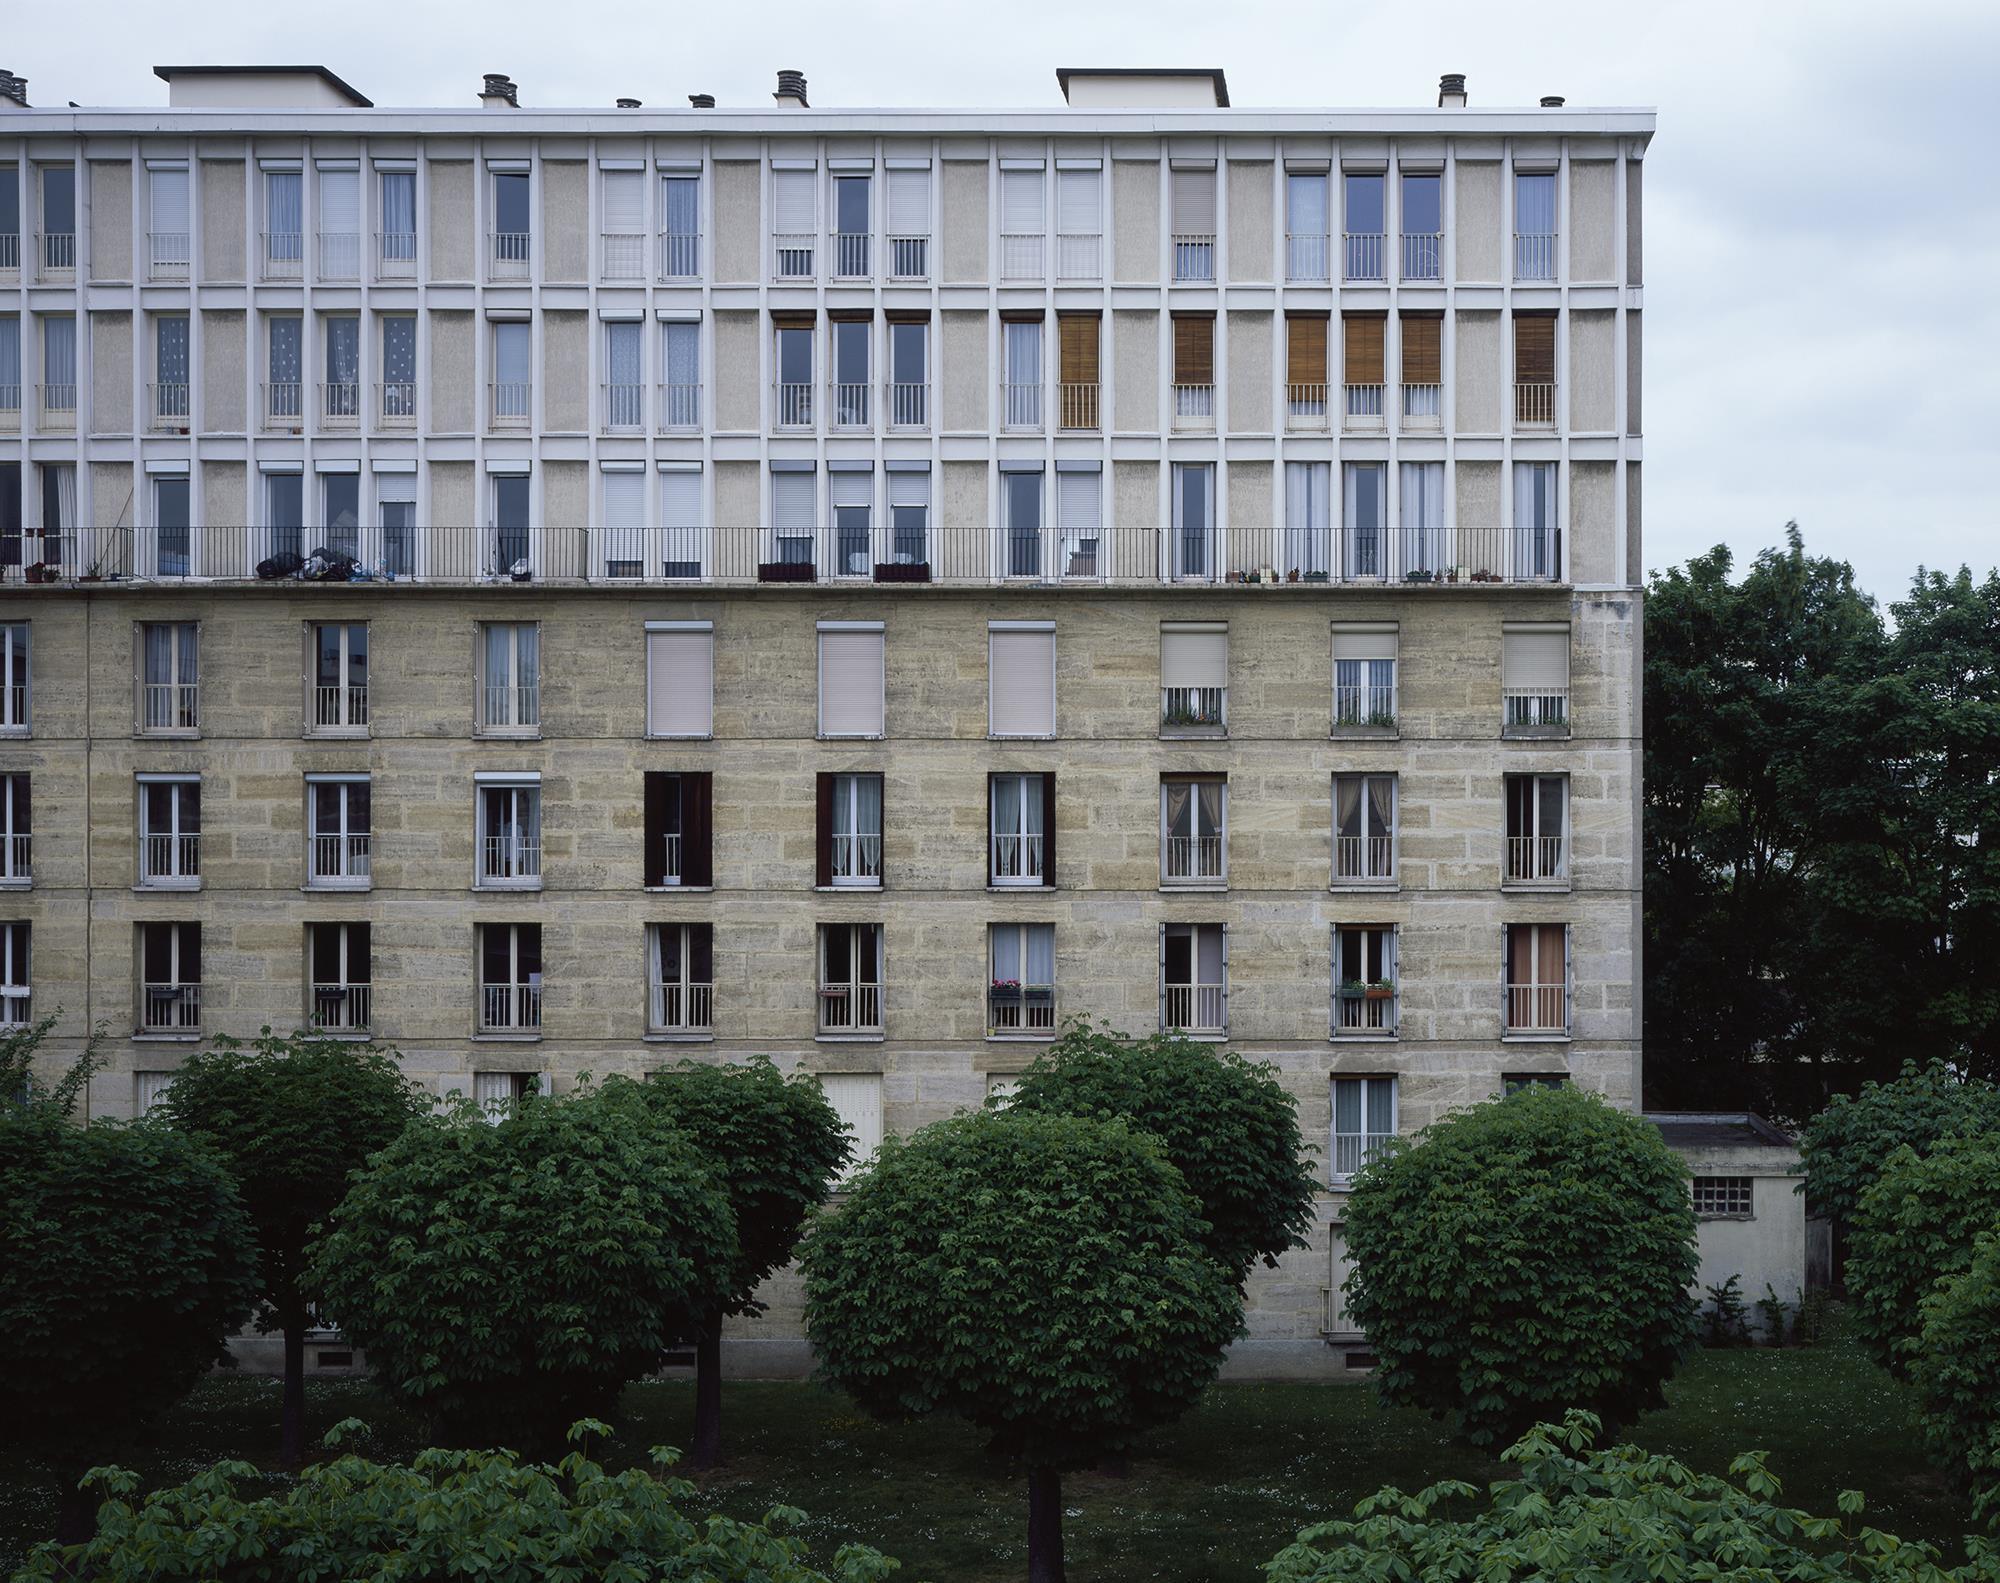 Fernand pouillon master of the modern middle class for Msc modern building design